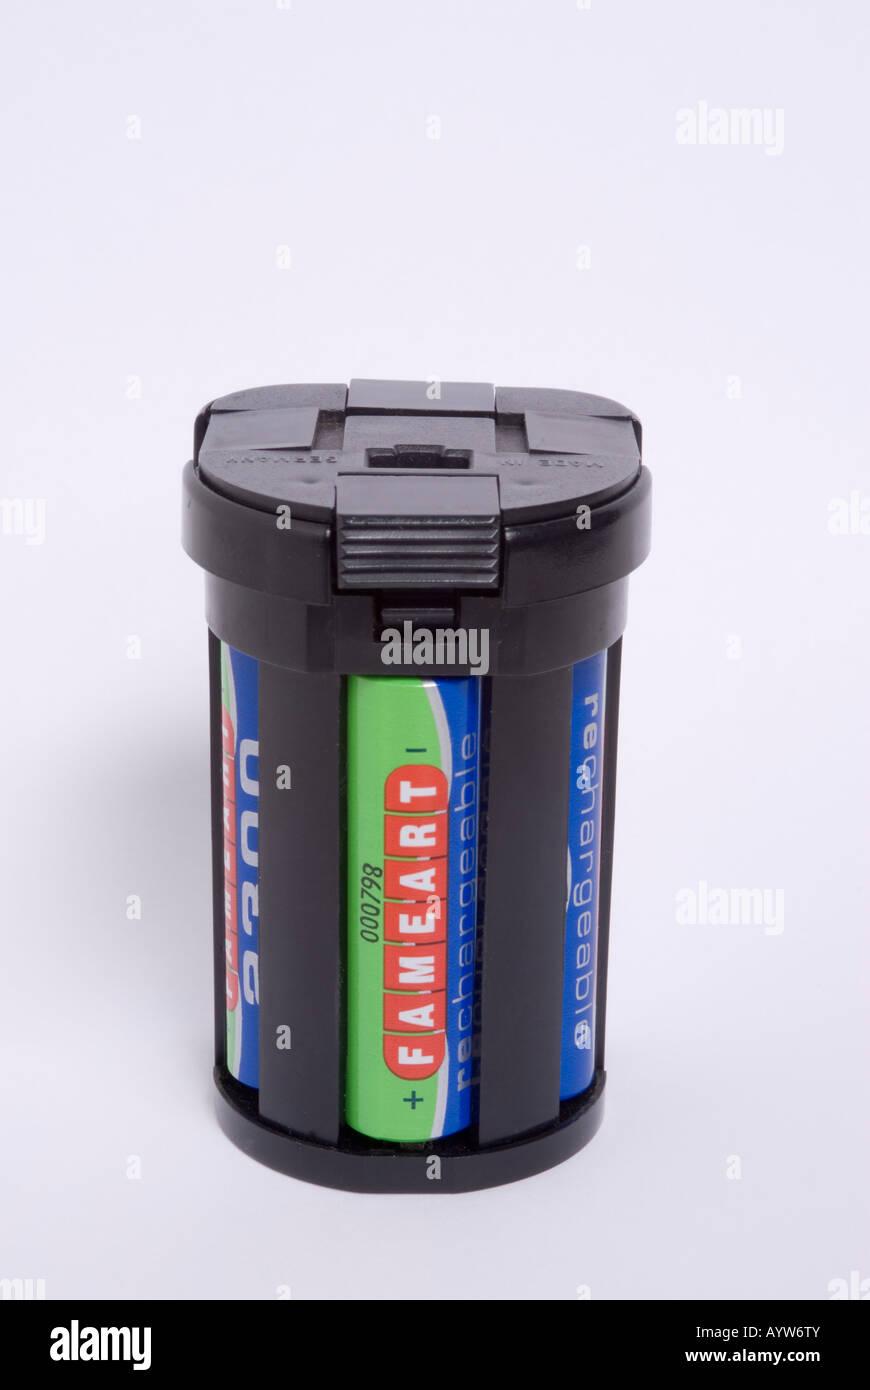 Battery Pack For Metz Flashgun - Stock Image